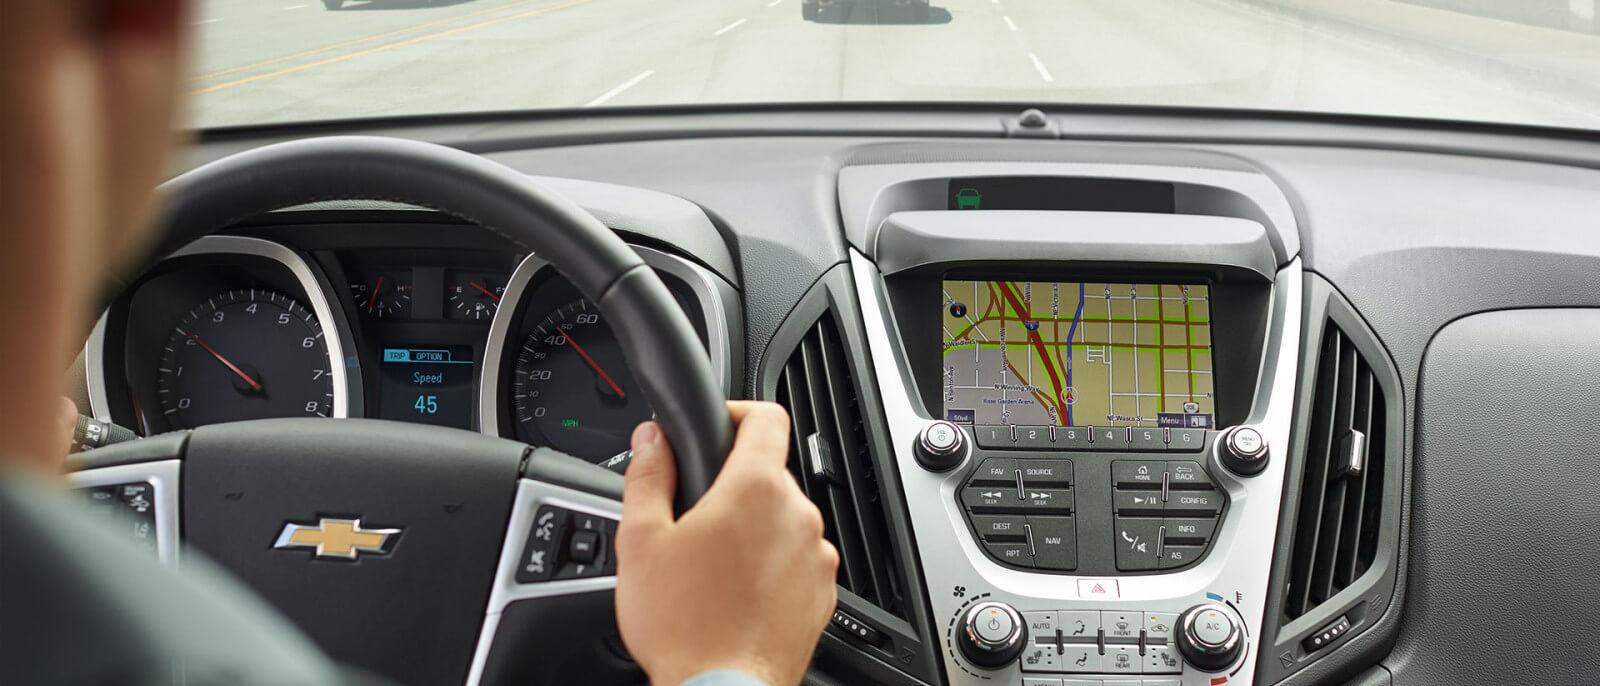 Chevrolet Equinox navigation